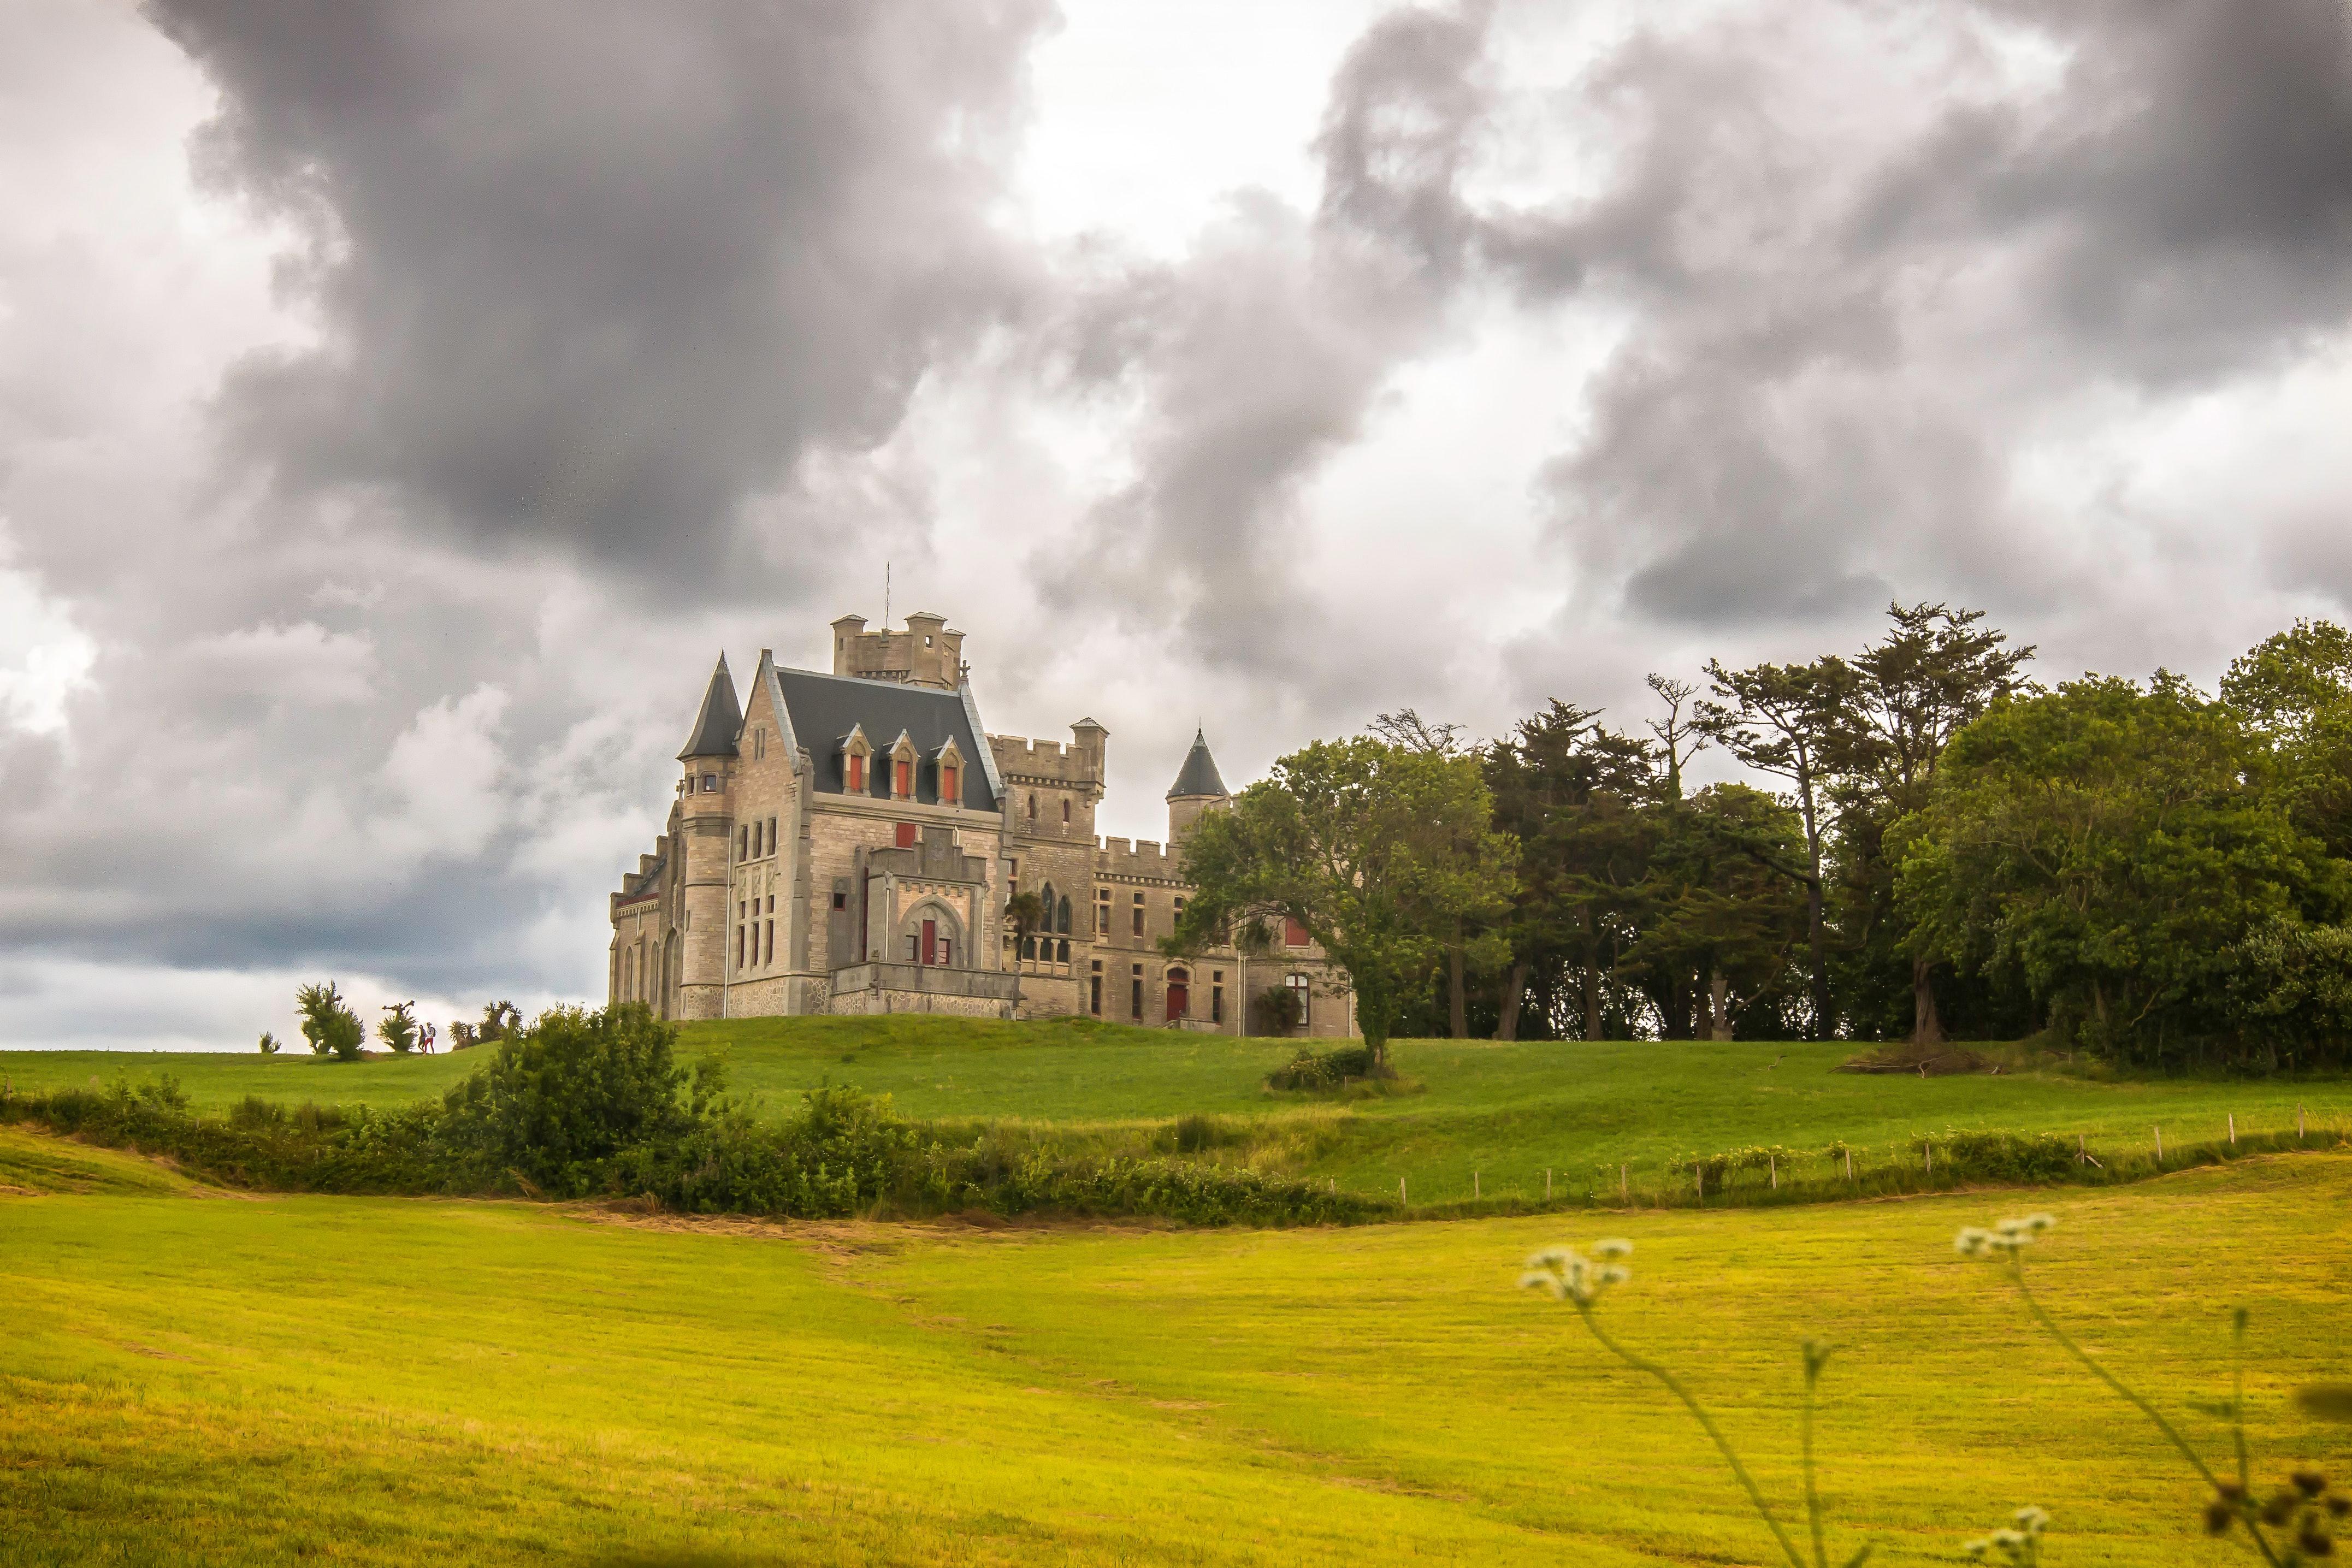 White and Black Concrete Castle on Daytime, Architecture, Building, Castle, Grass, HQ Photo